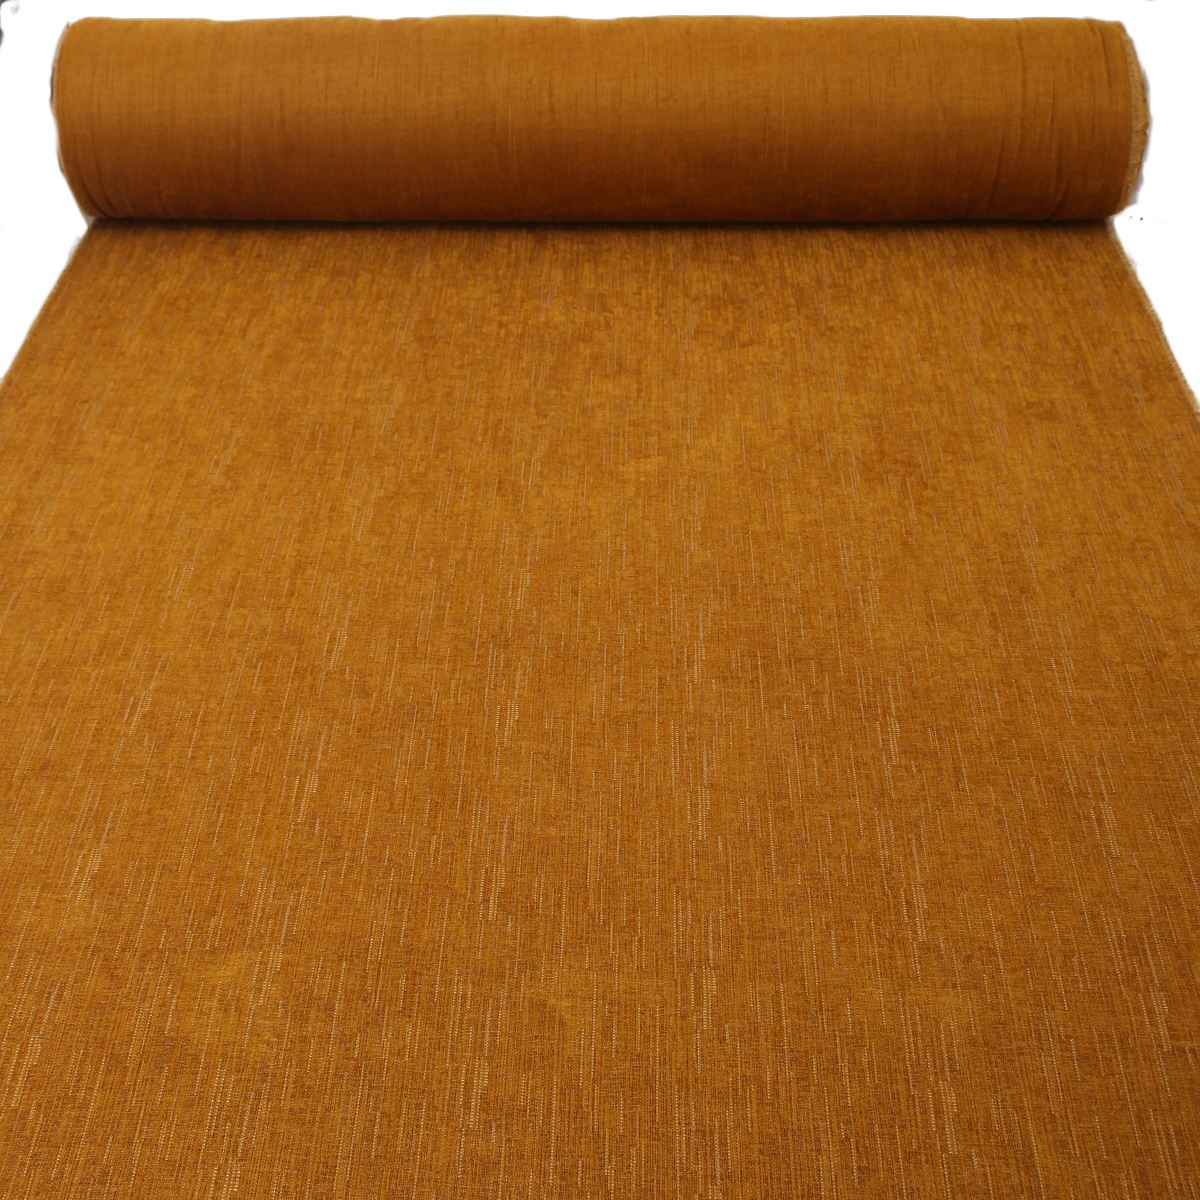 034-Chenille-034-Slubbed-Shabby-Worn-Look-Curtain-Cushion-Sofa-Upholstery-Fabric thumbnail 36